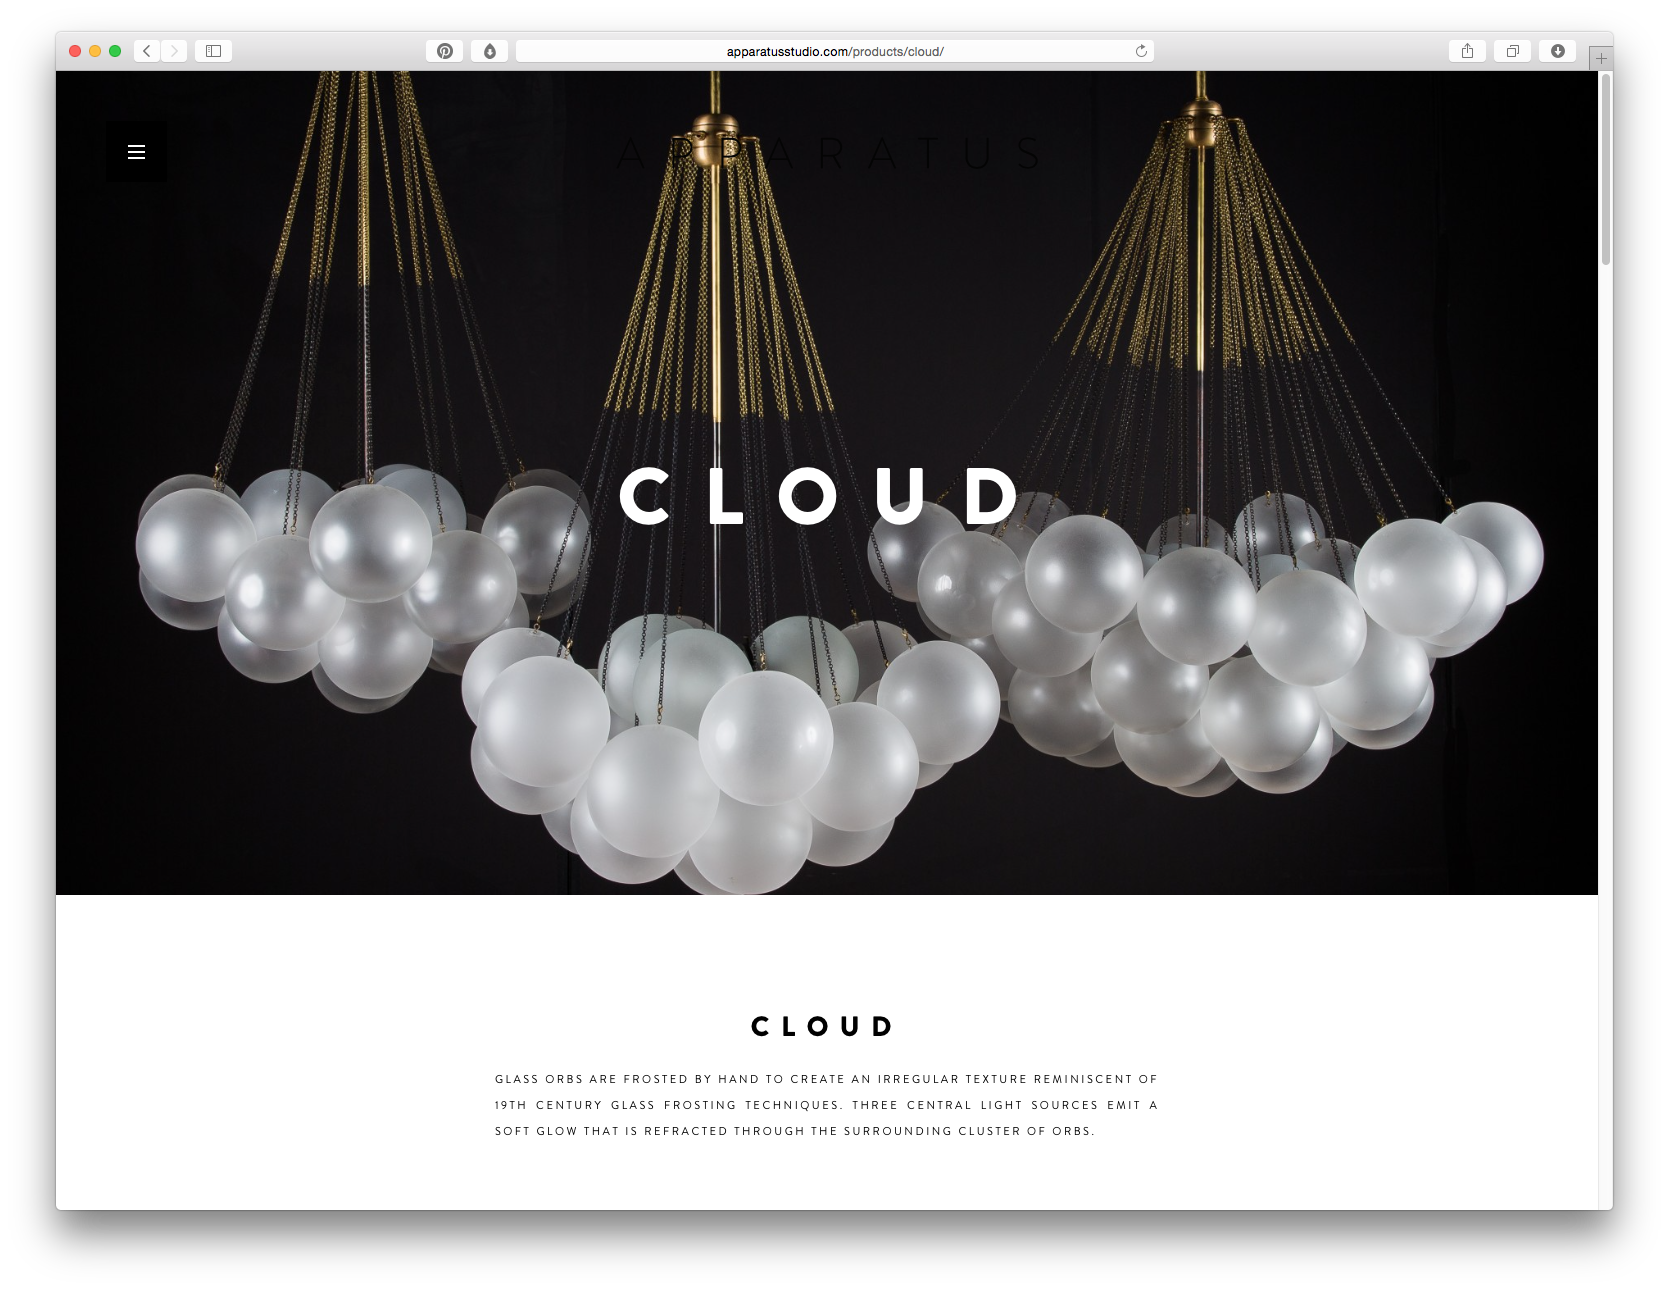 Apparatus Cloud